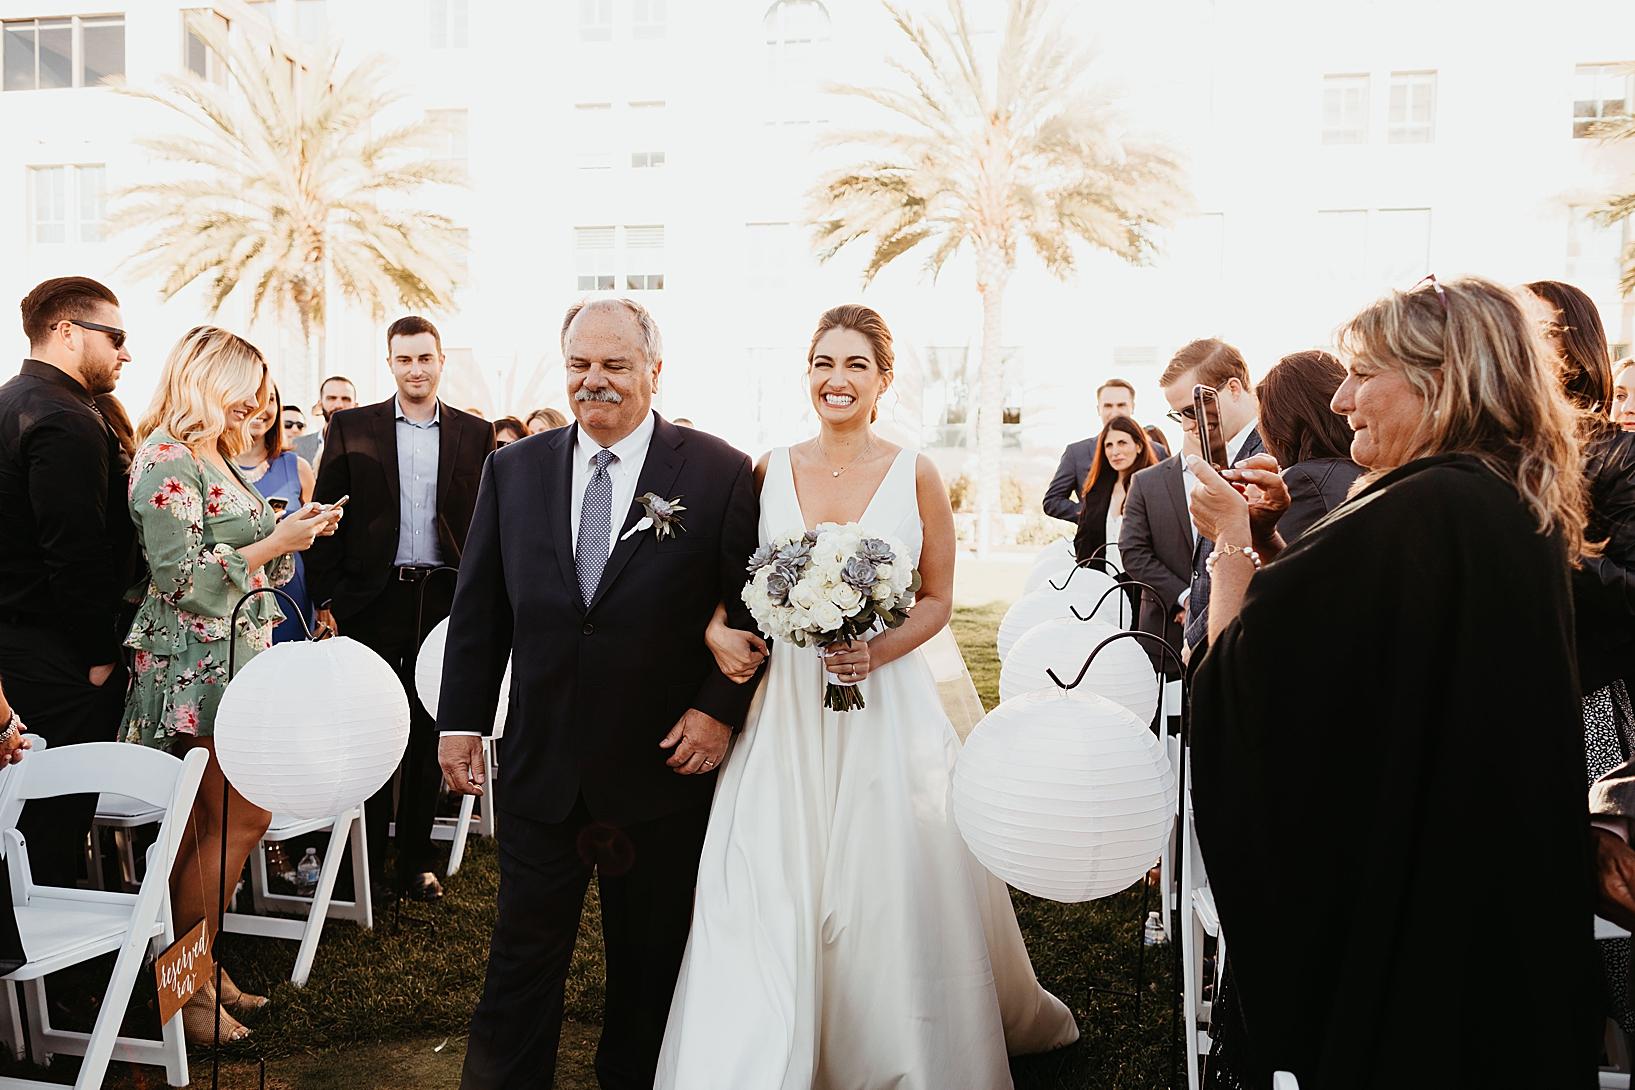 Herb-and-Wood-Wedding-35.jpg